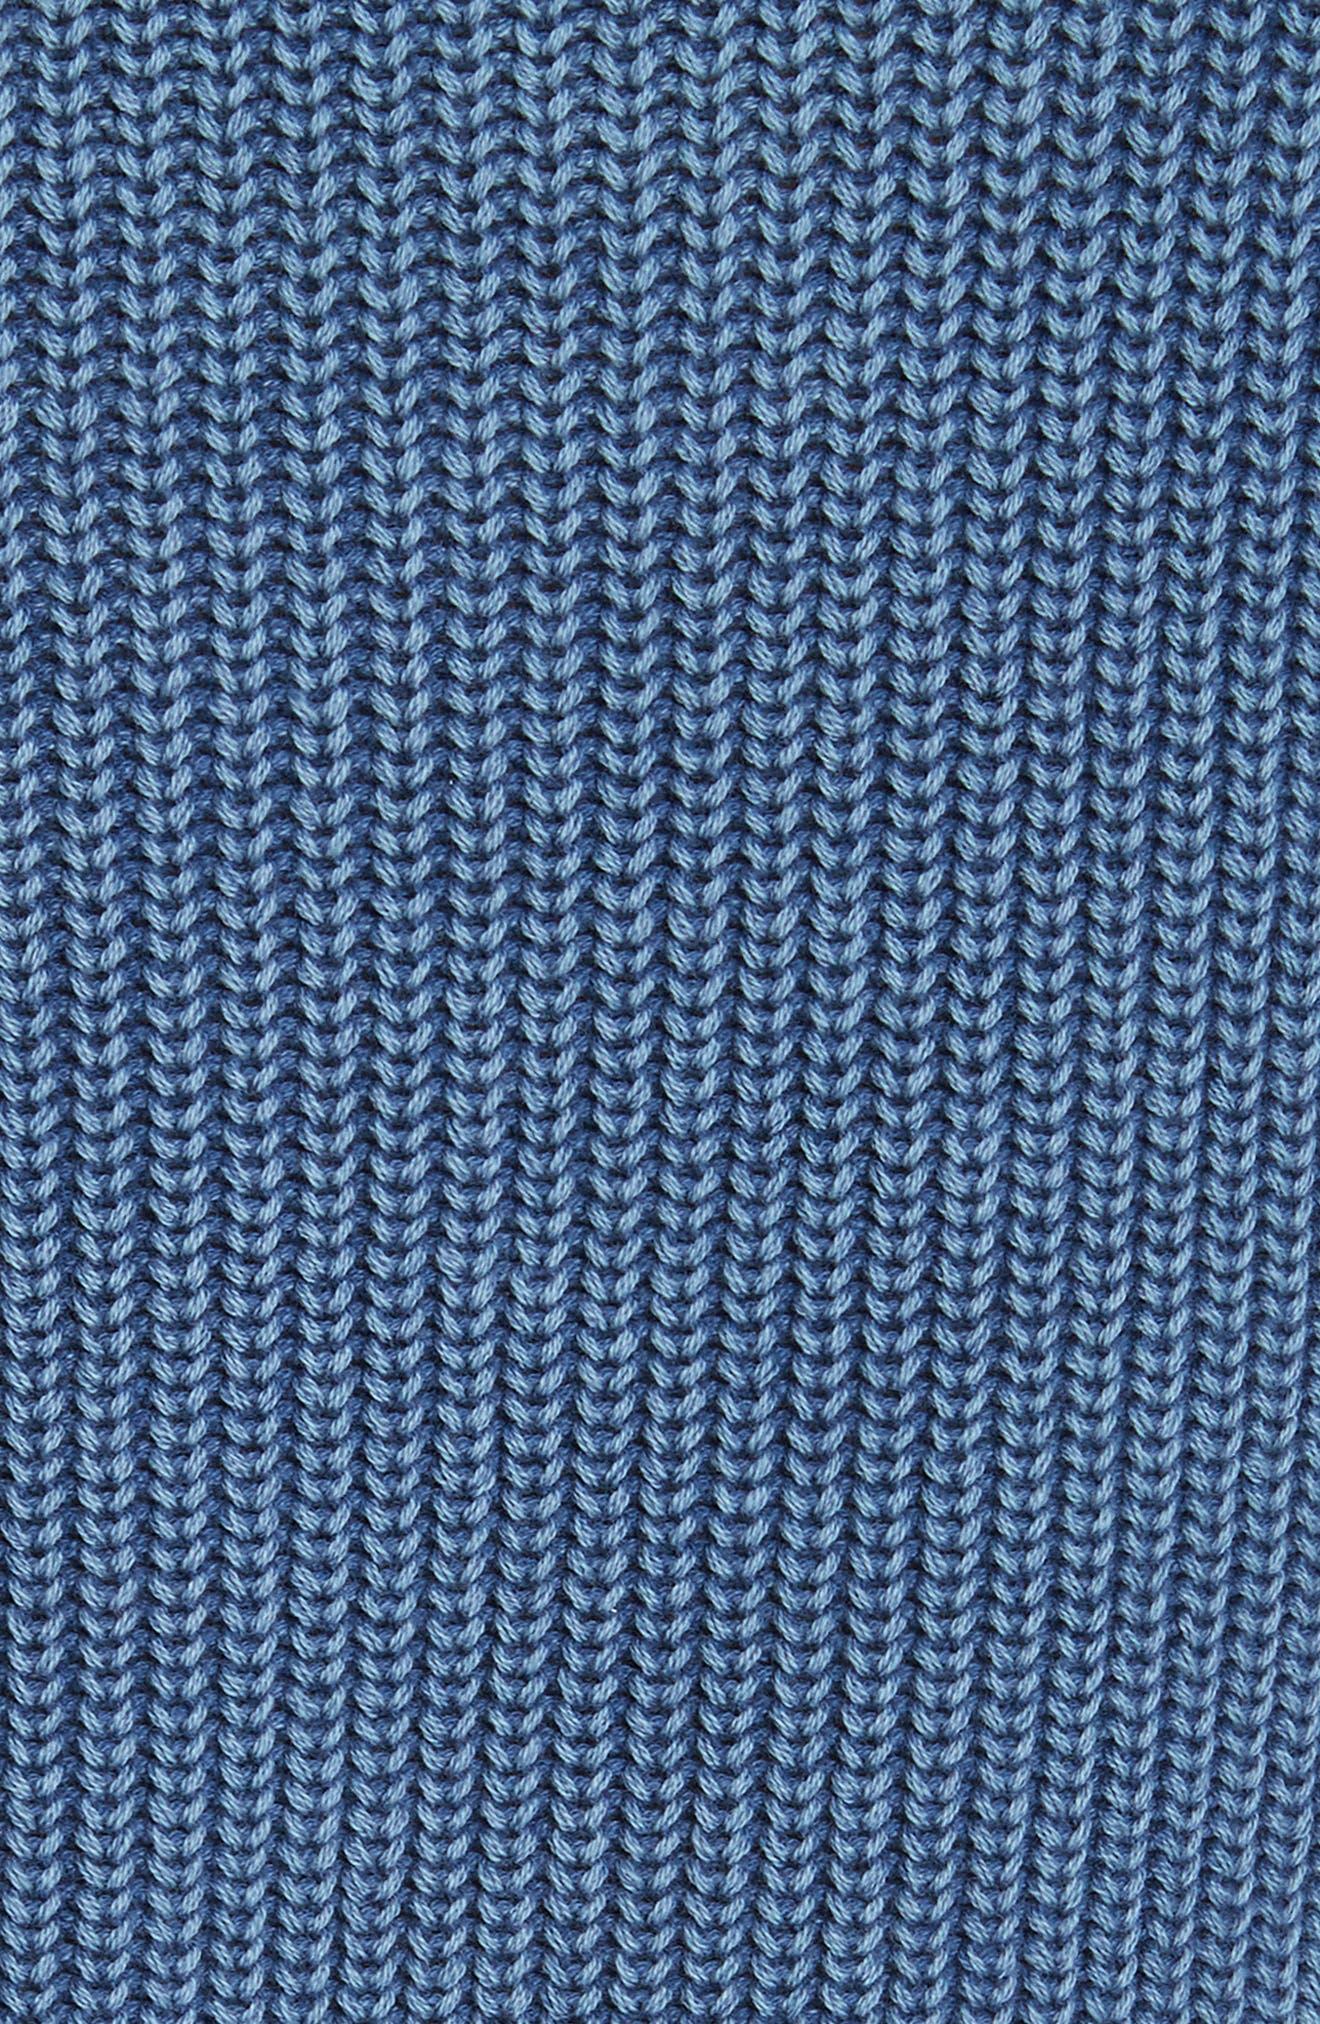 Dawn Off the Shoulder Knit Top,                             Alternate thumbnail 5, color,                             Indigo